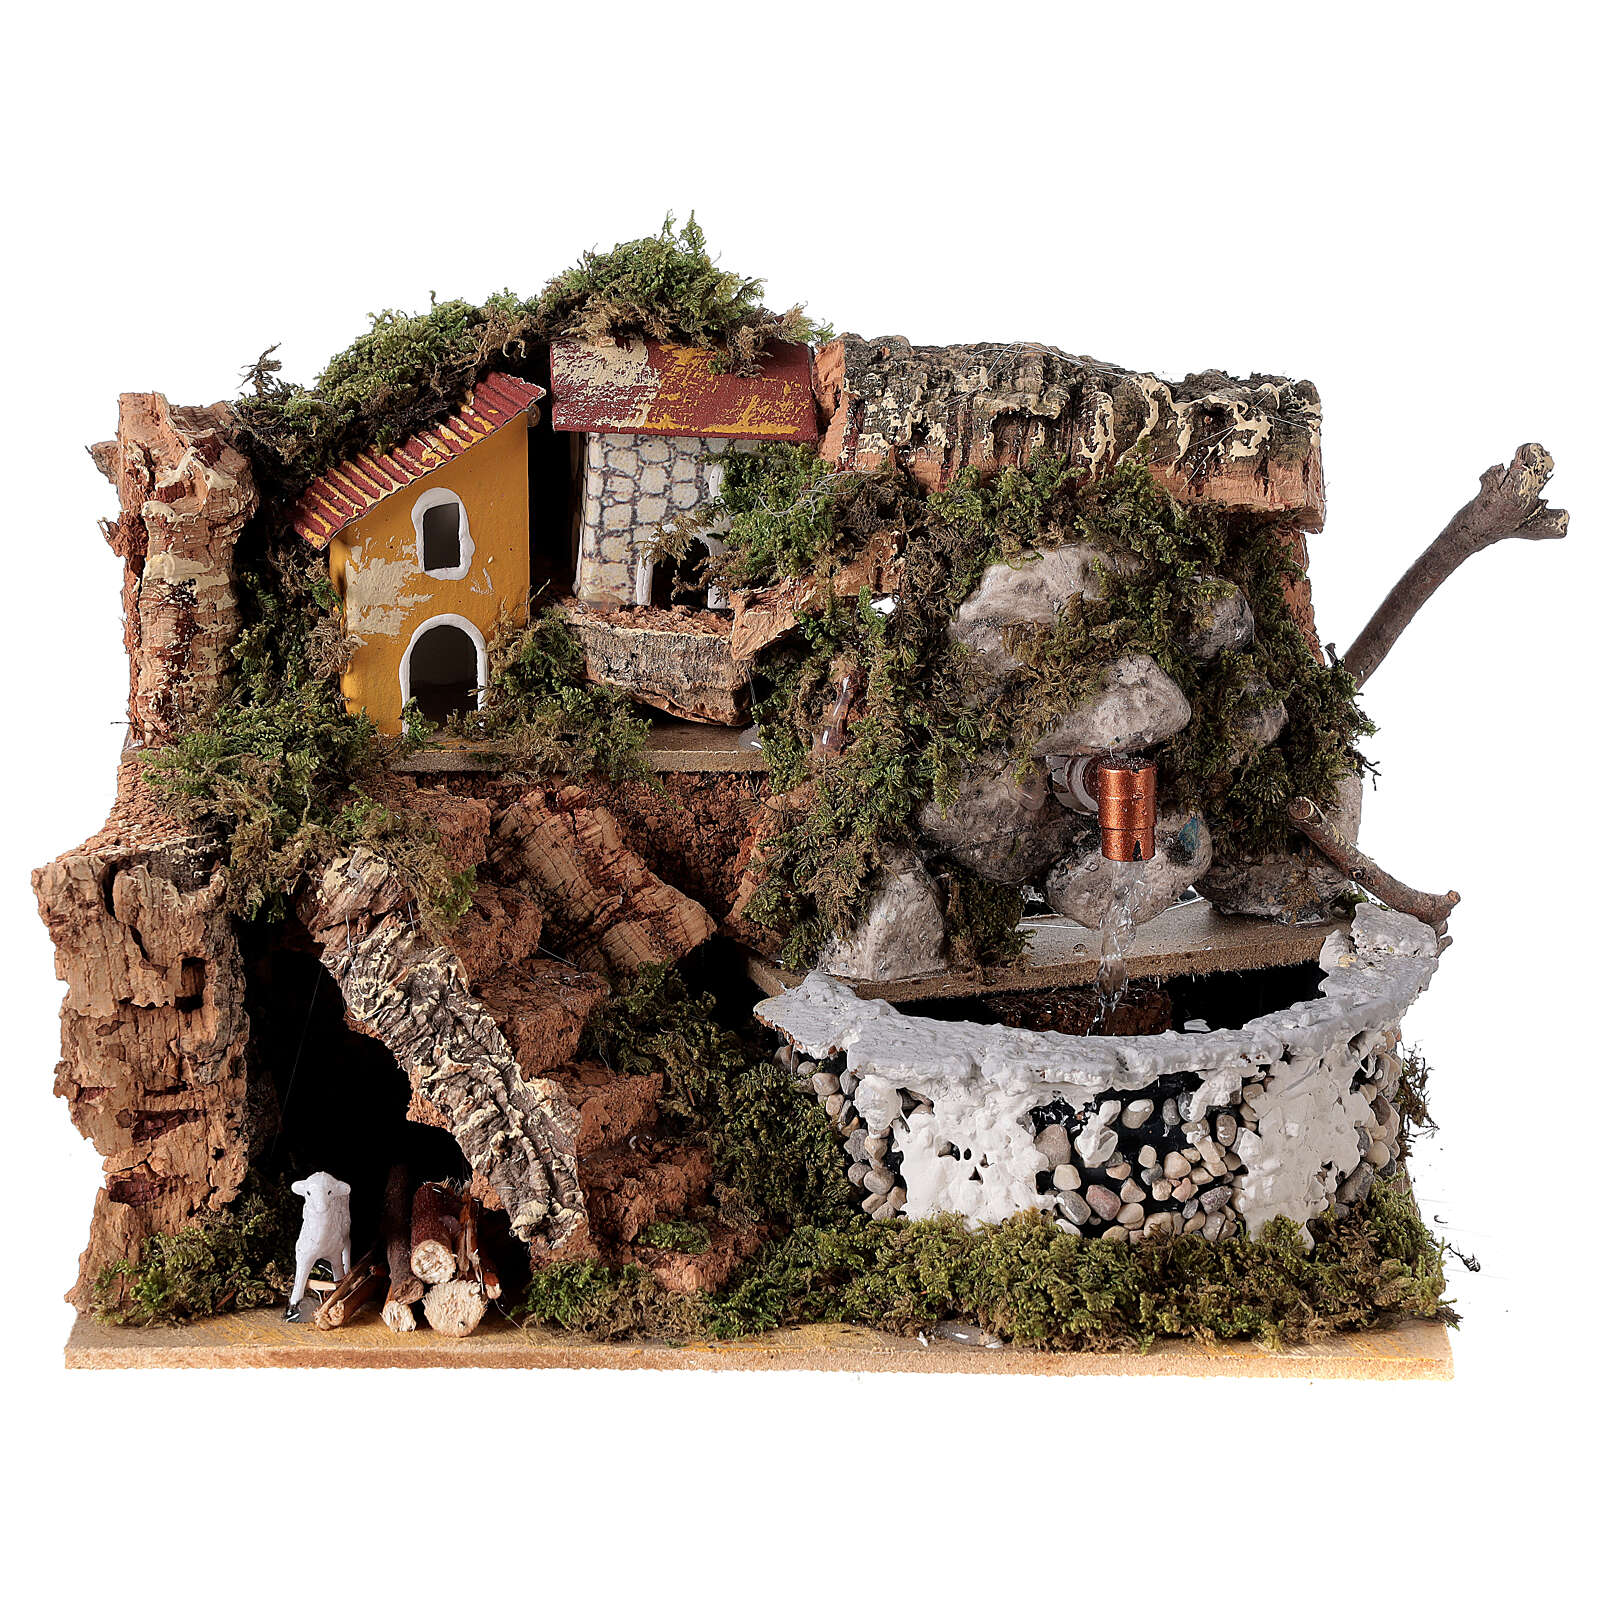 Stone Nativity scene fountain 15x20x15 cm for Nativity scenes 8-10 cm 4